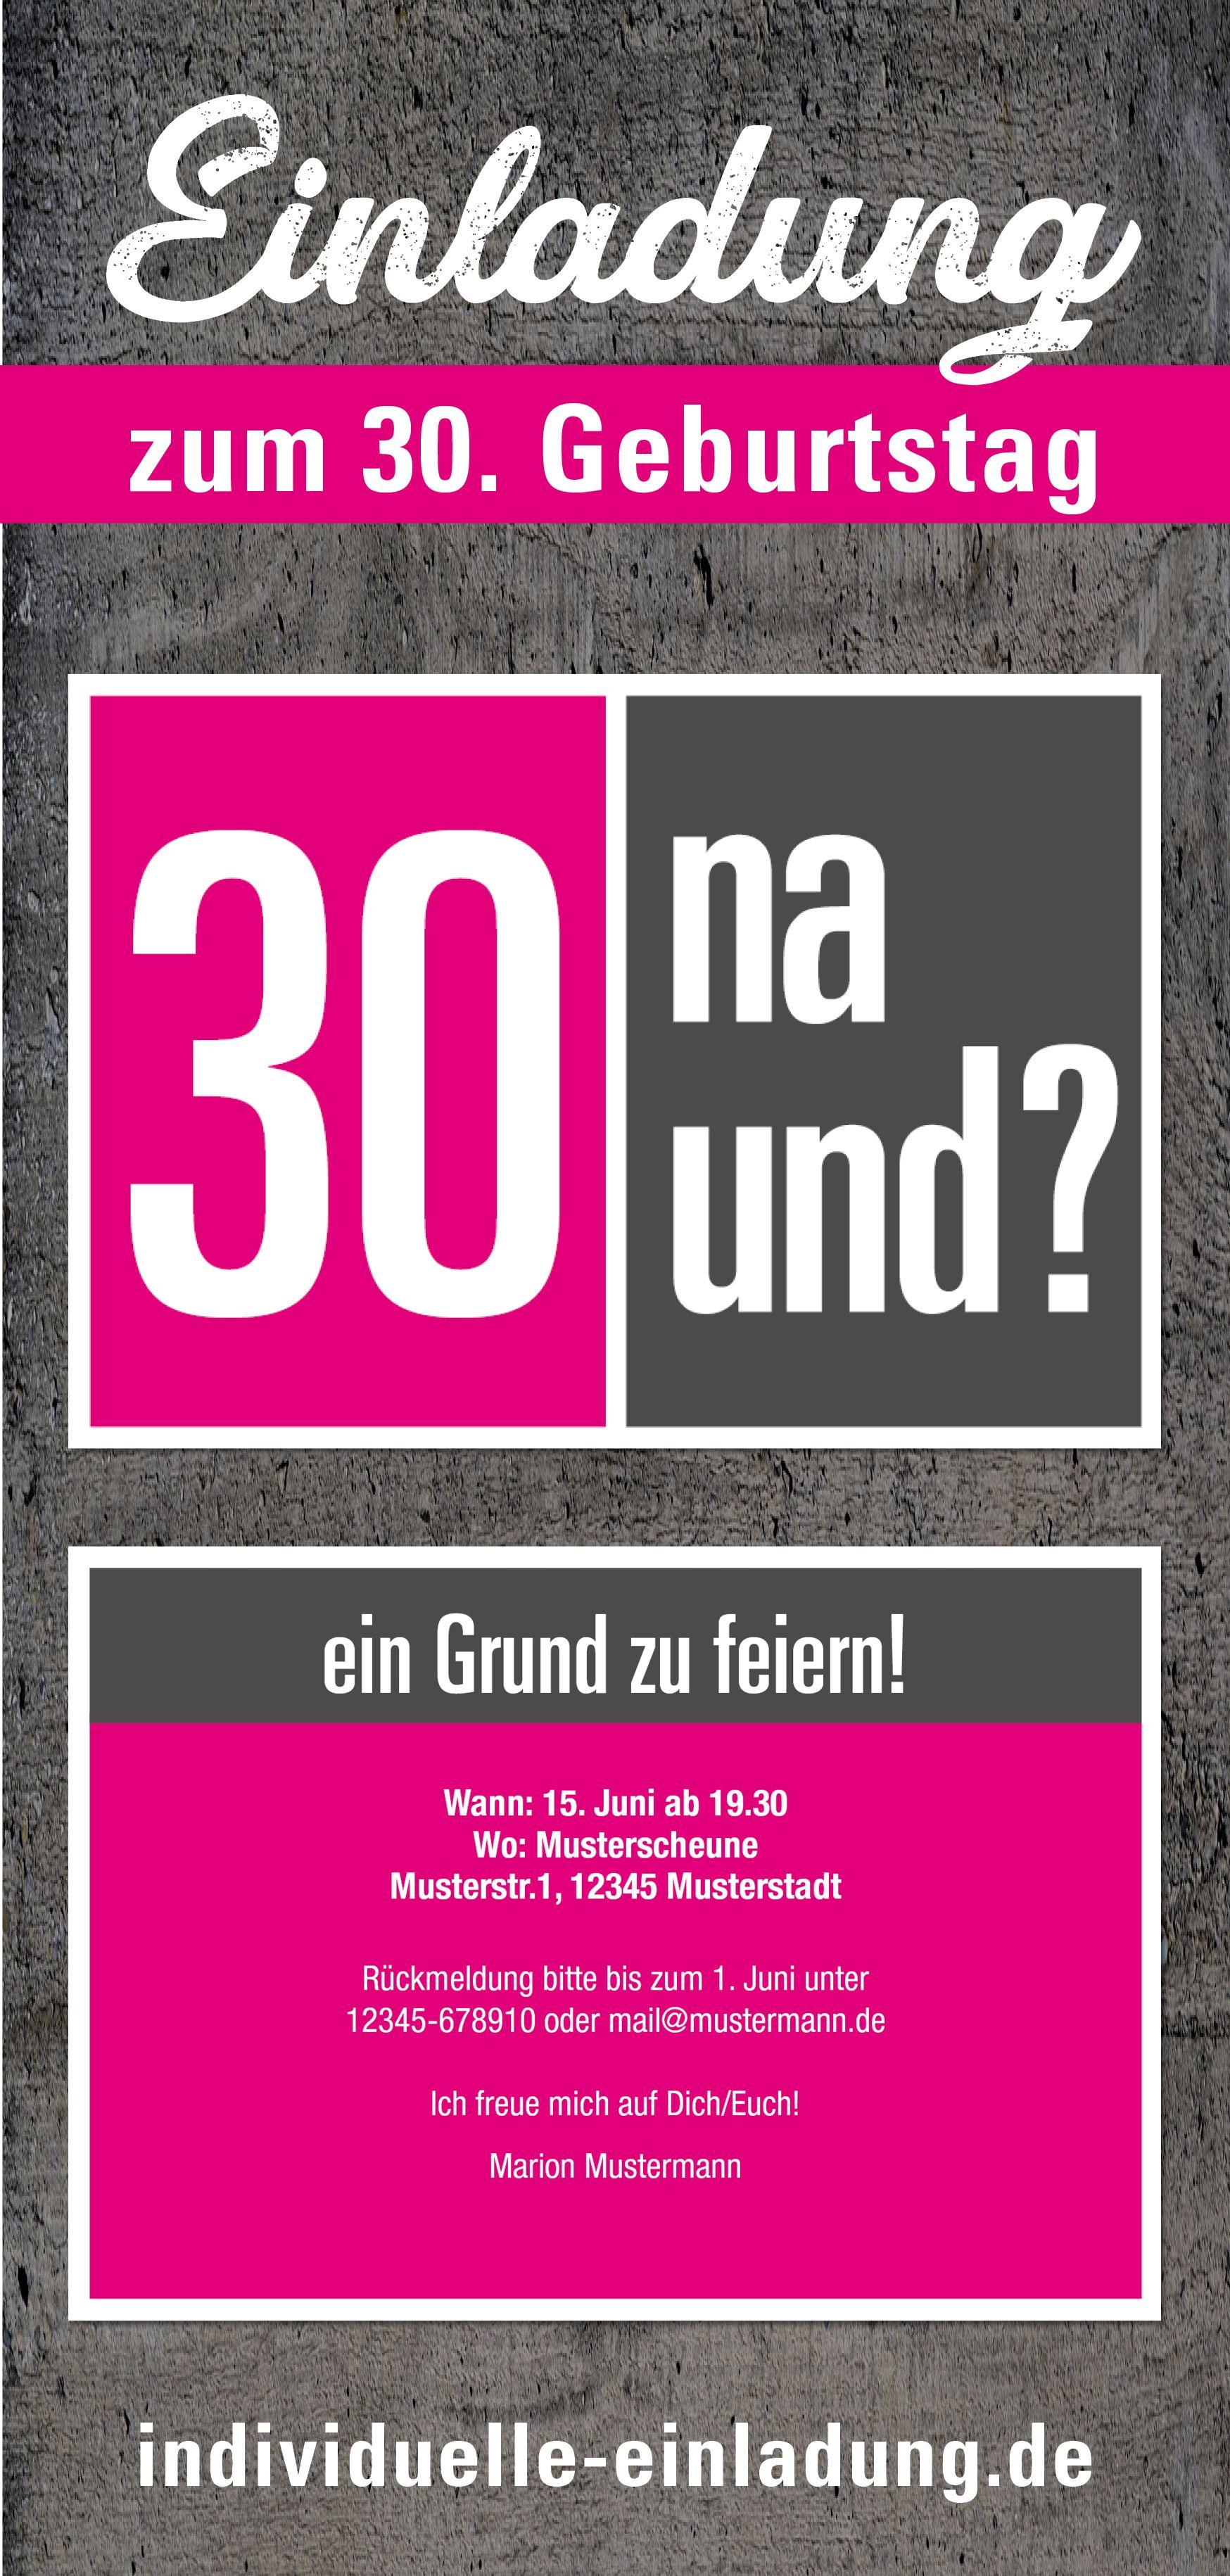 1980 Geburtstagsblatt Individualisiert 40 Geburtstag Chronik I